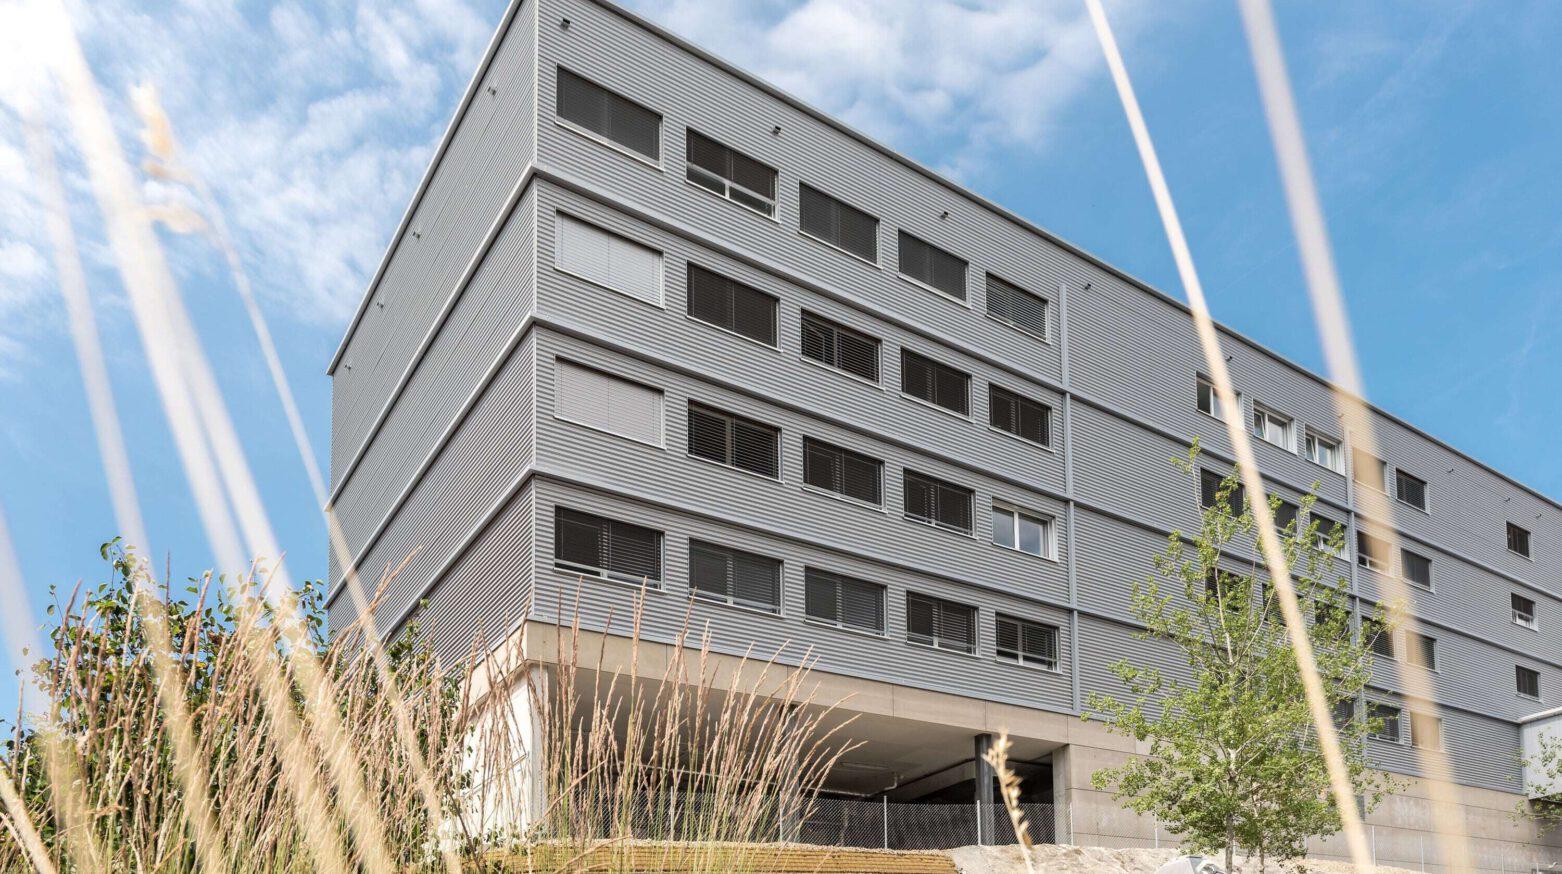 Inselspital Bern 01